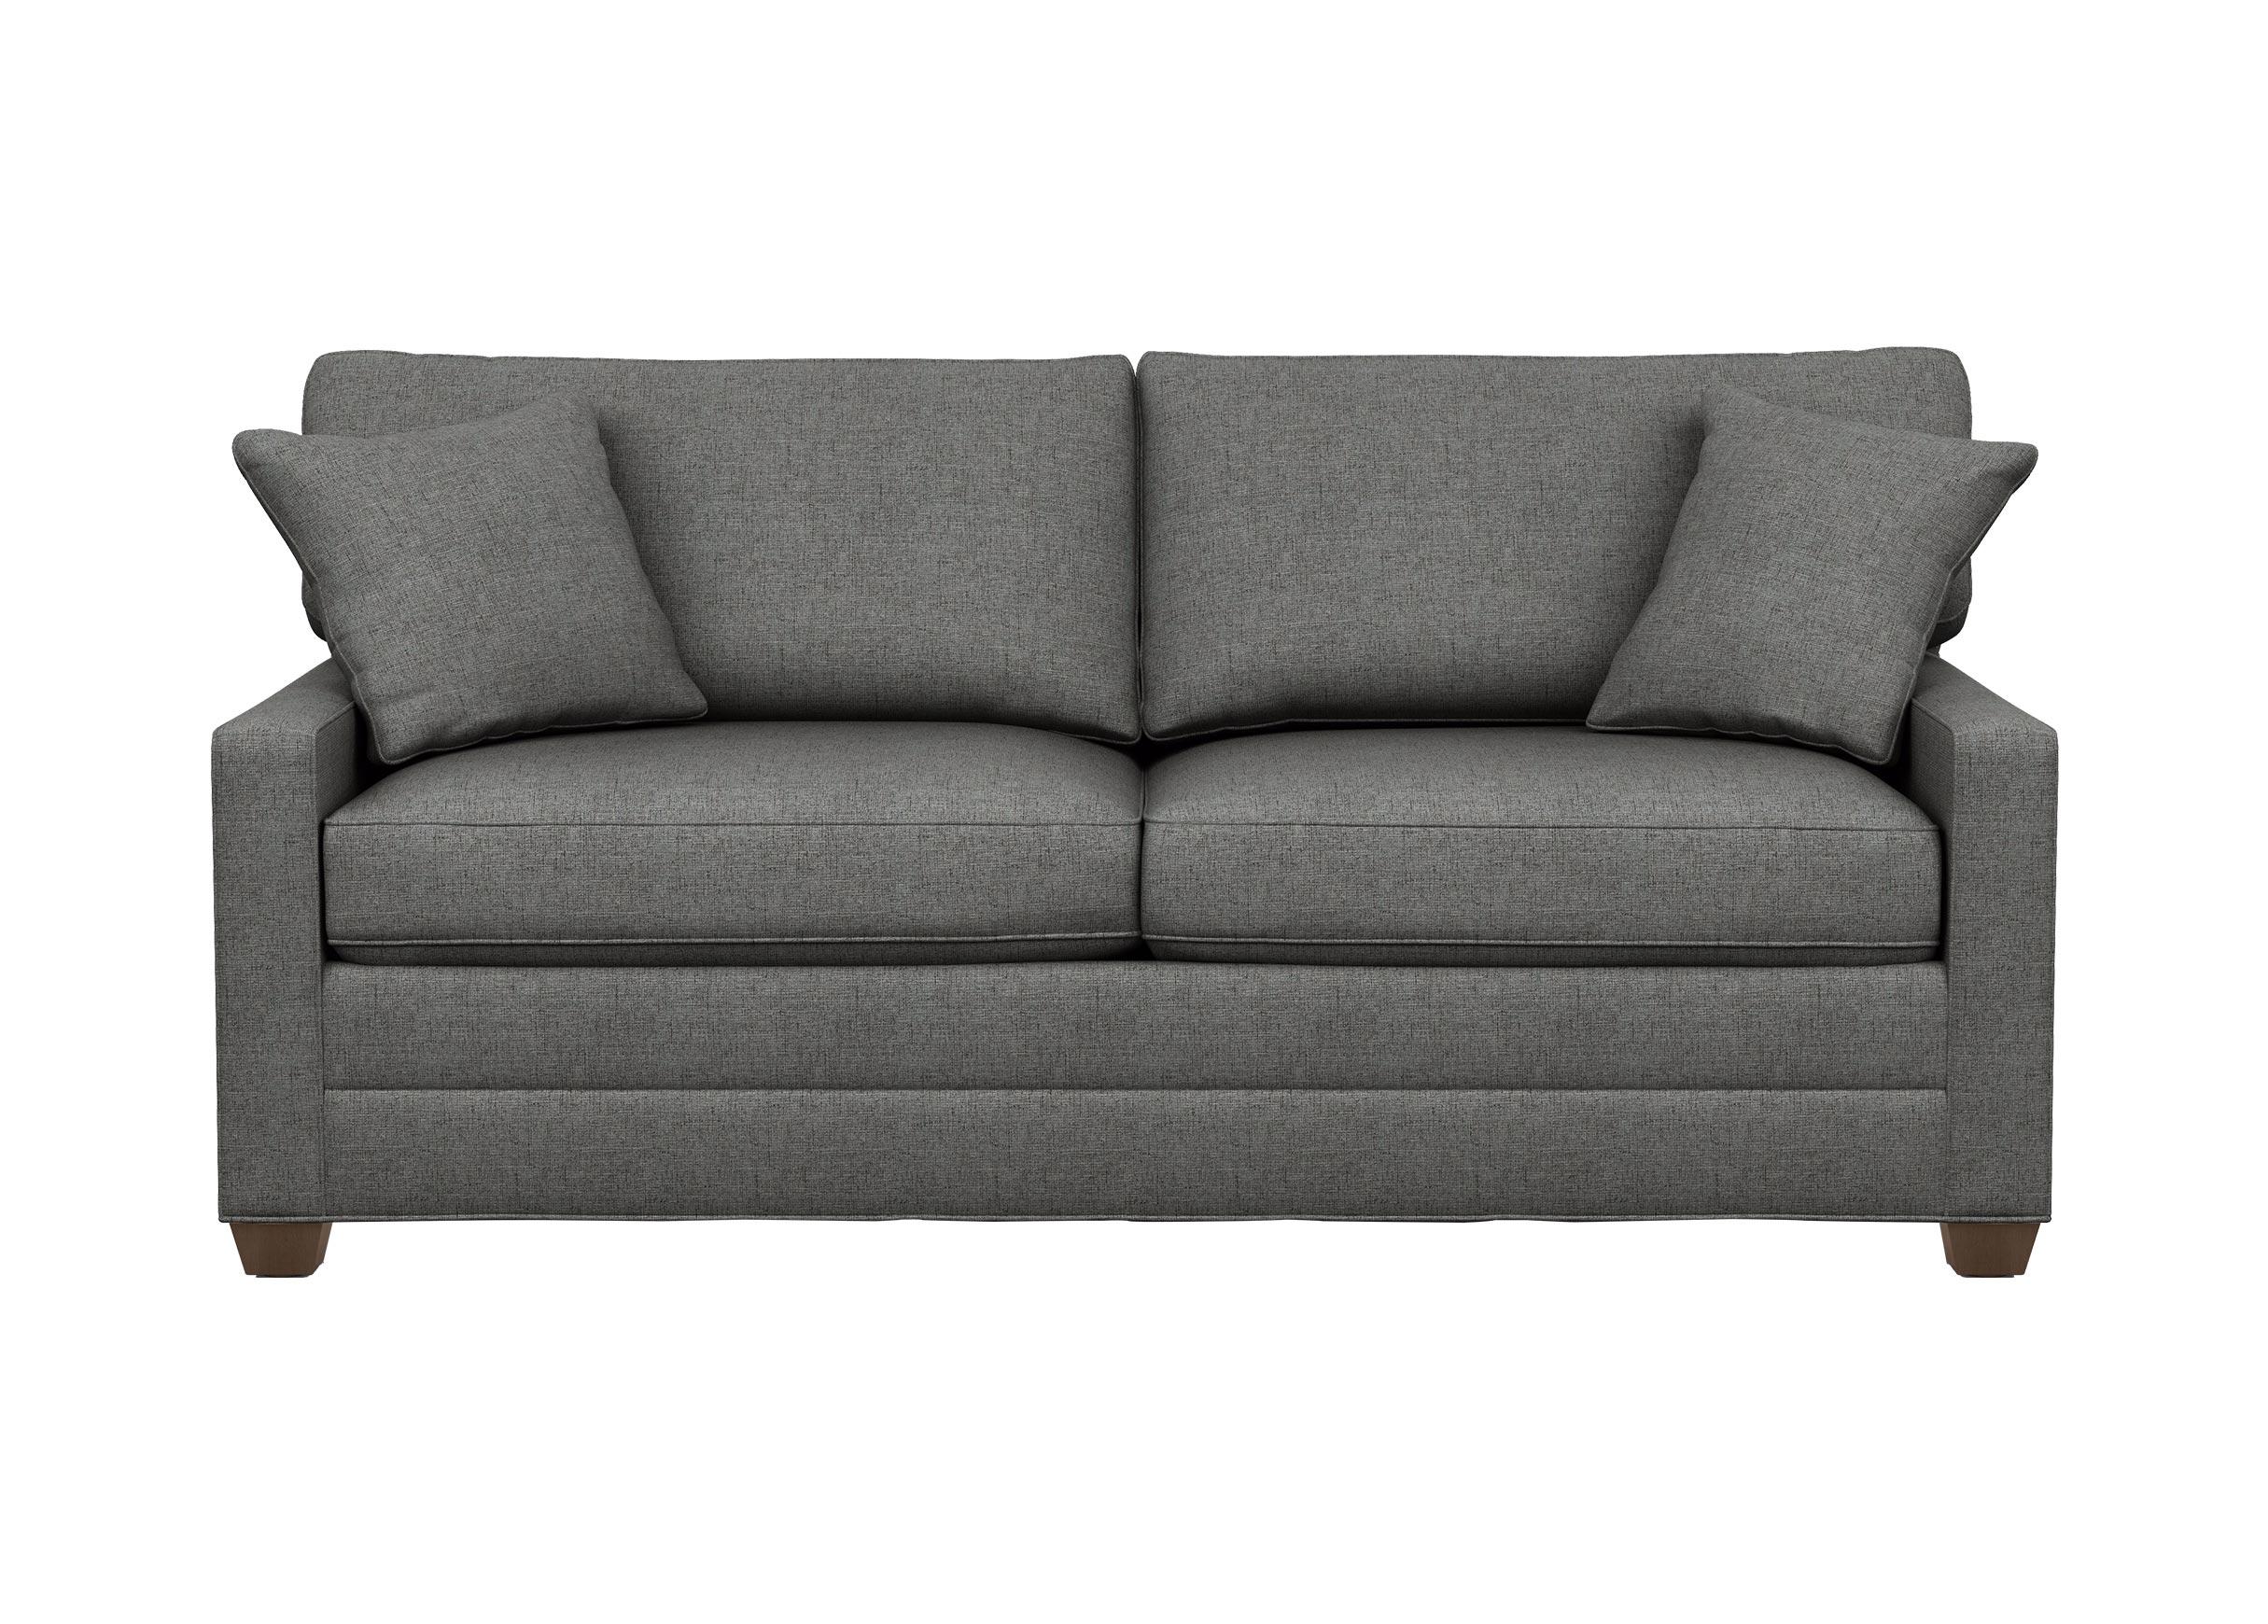 bennett track arm two seat sofa sofas loveseats ethan allen. Black Bedroom Furniture Sets. Home Design Ideas